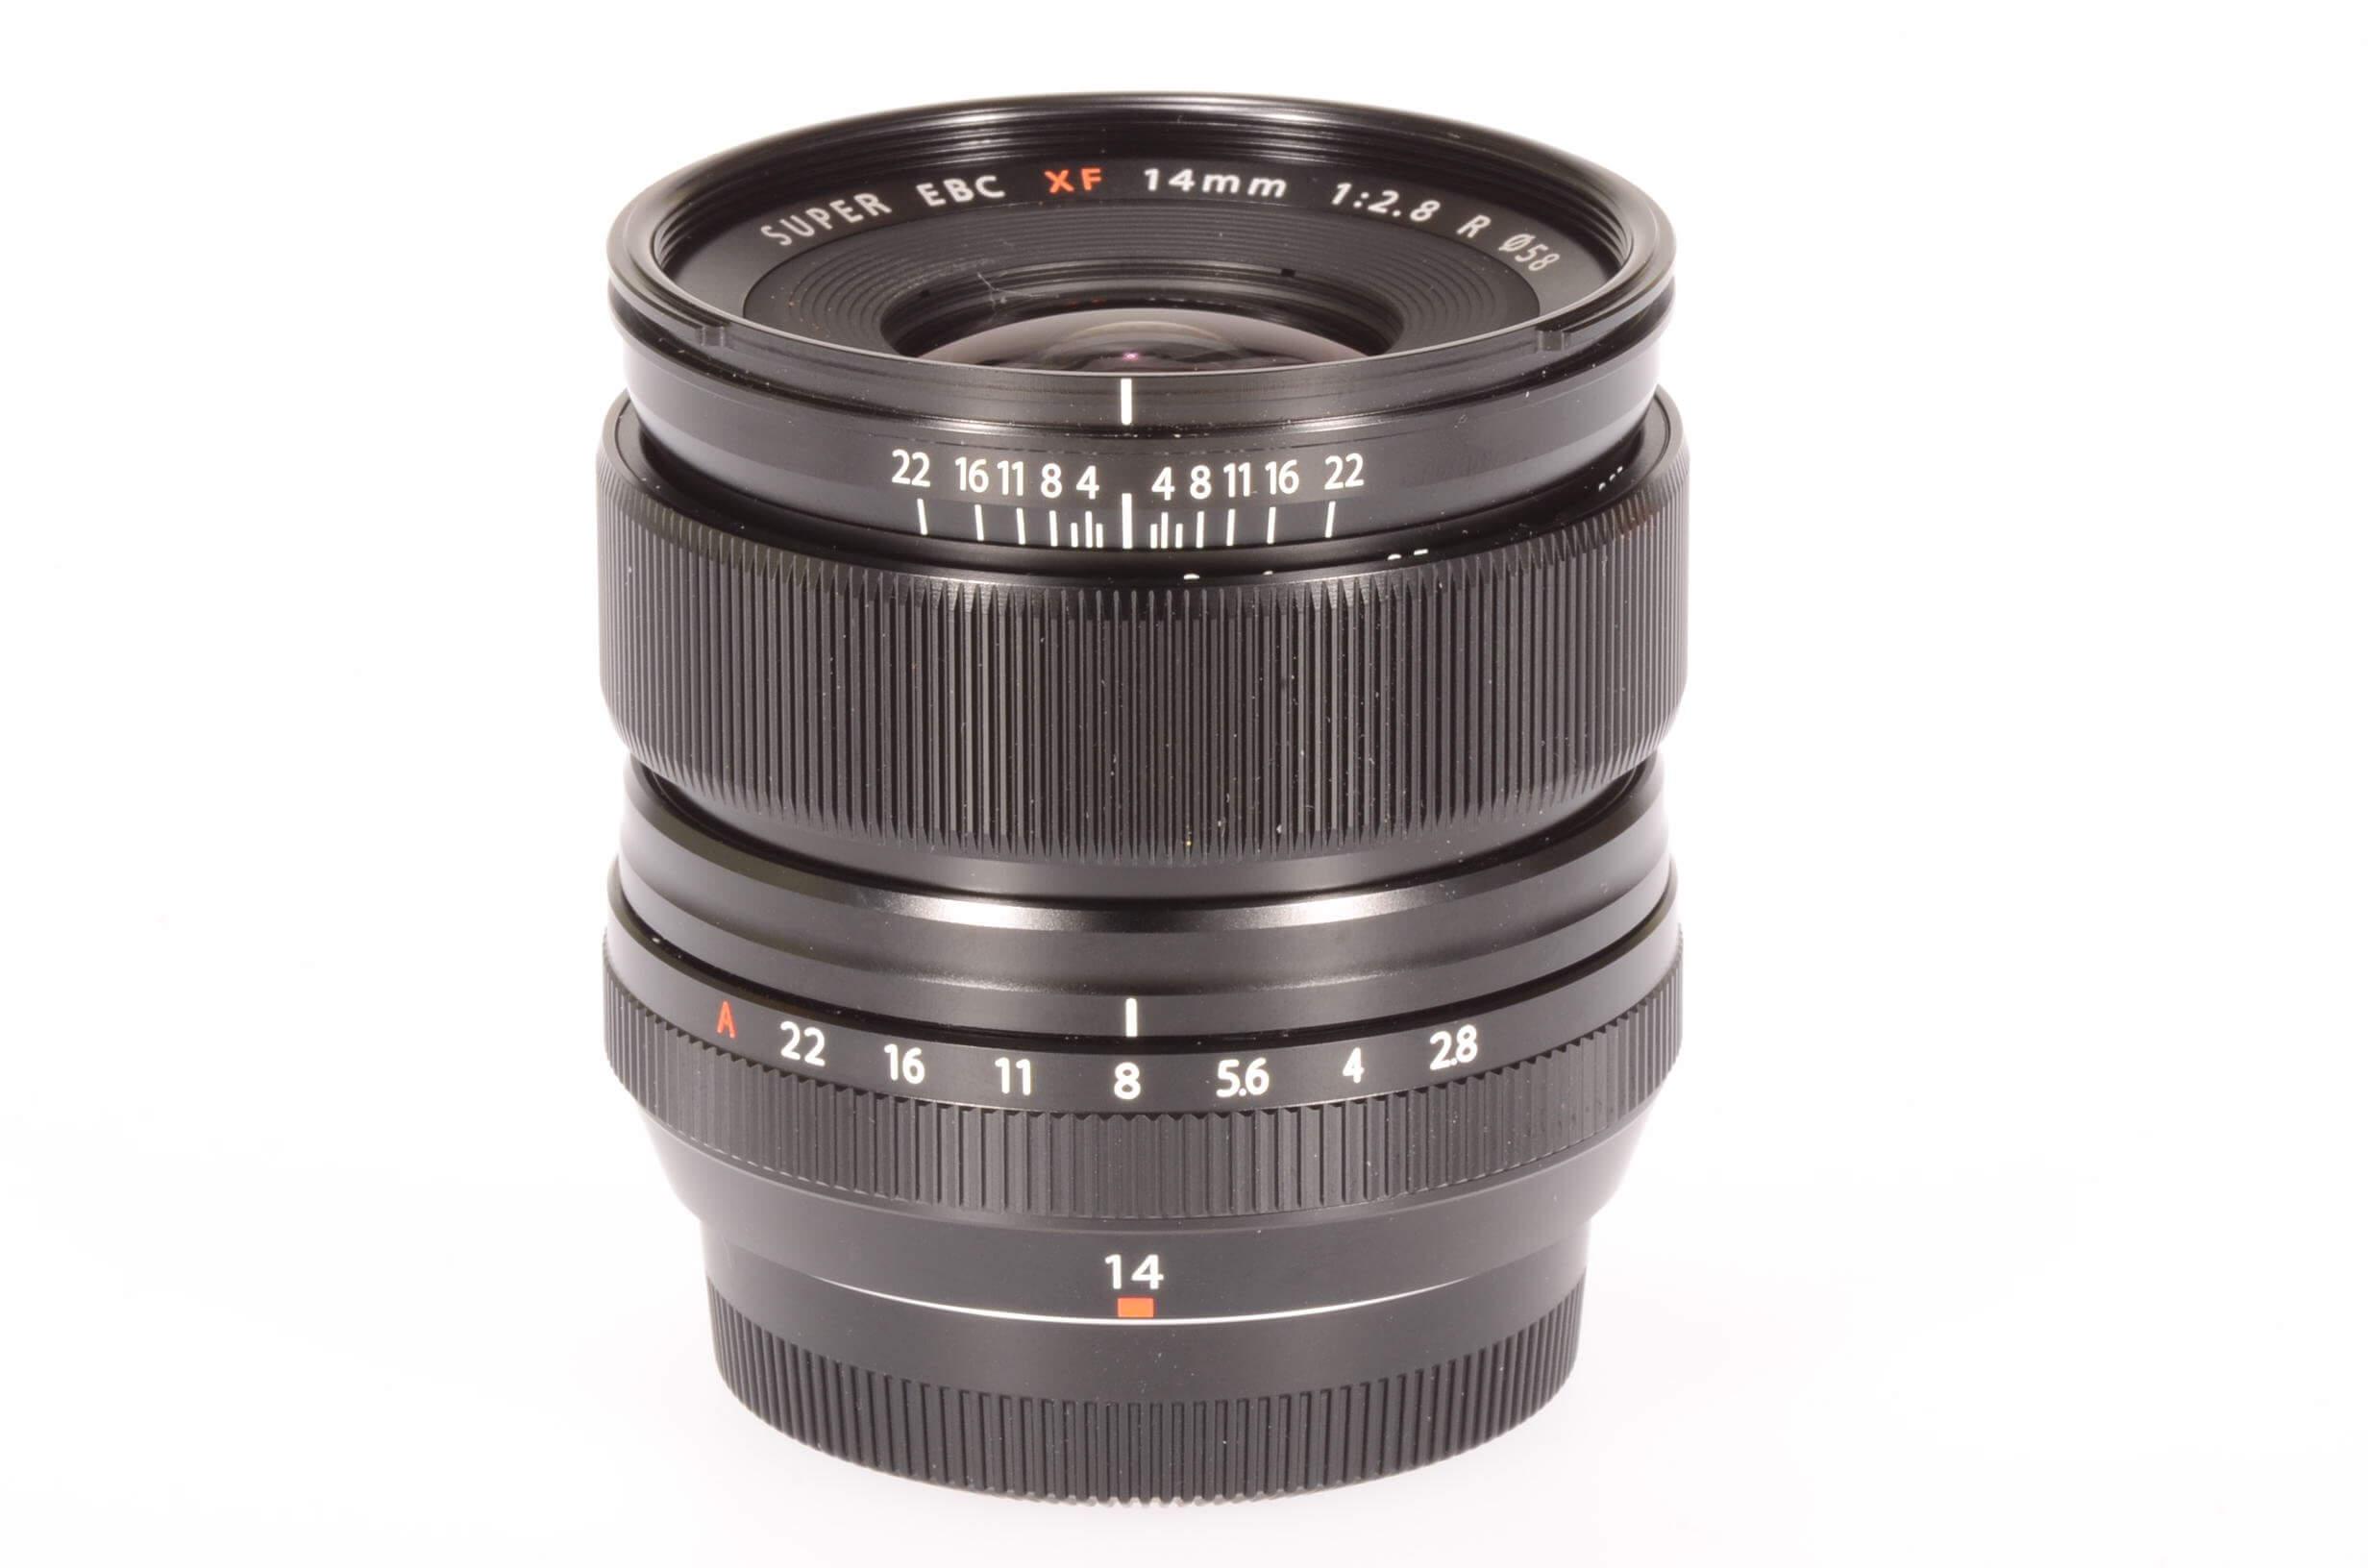 Fuji 14mm f2.8 XF R lens, UK supplied, 2 weeks old!